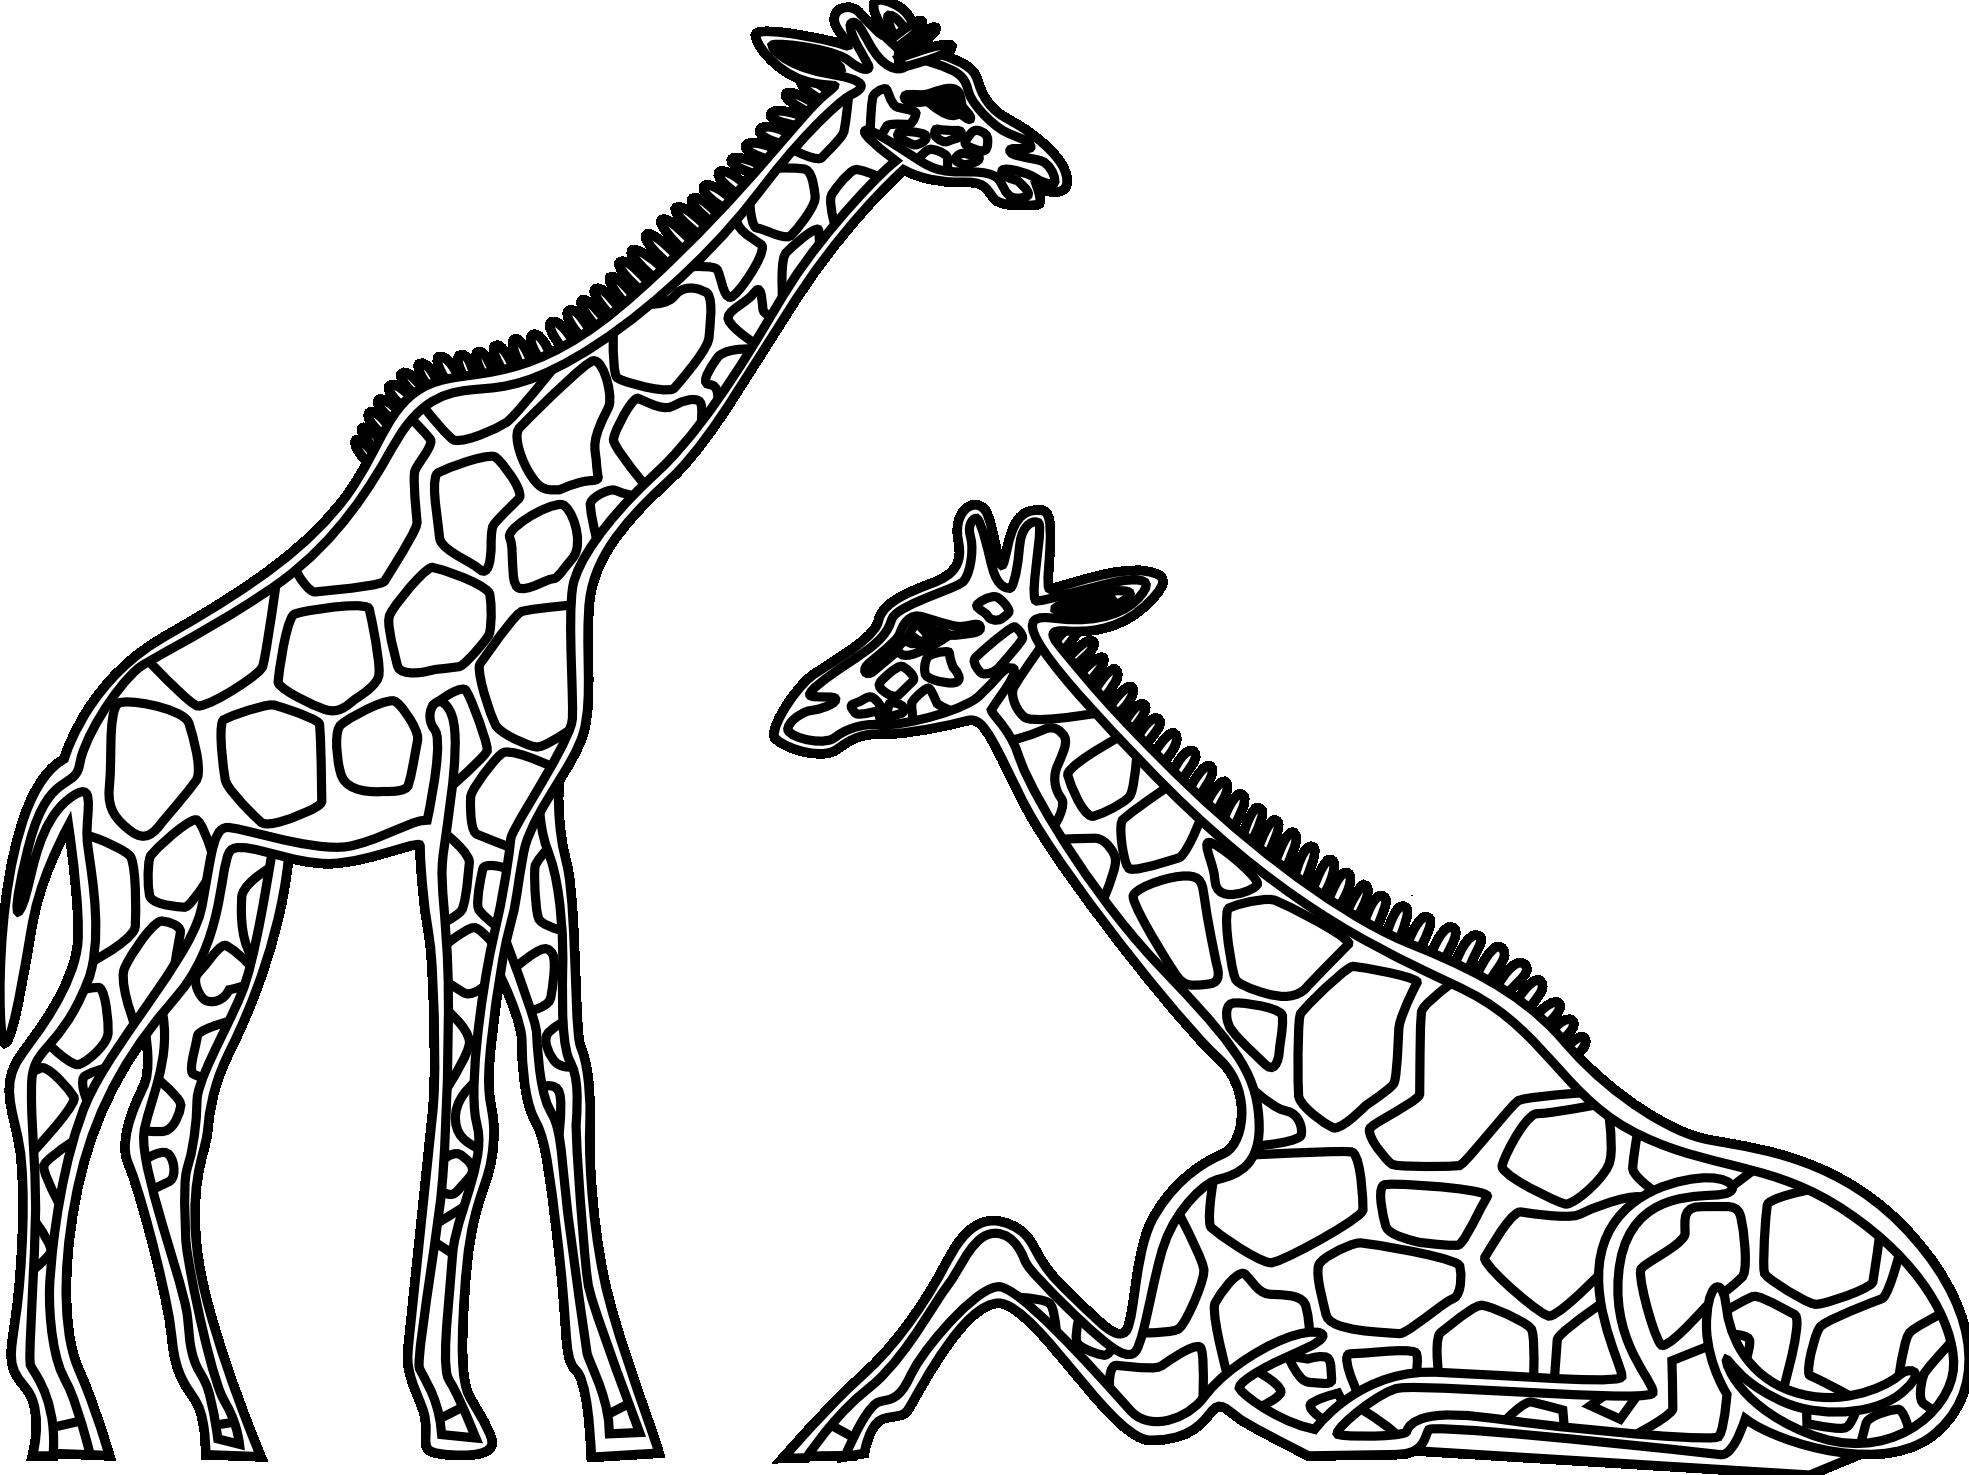 giraffe%20clipart%20black%20and%20white